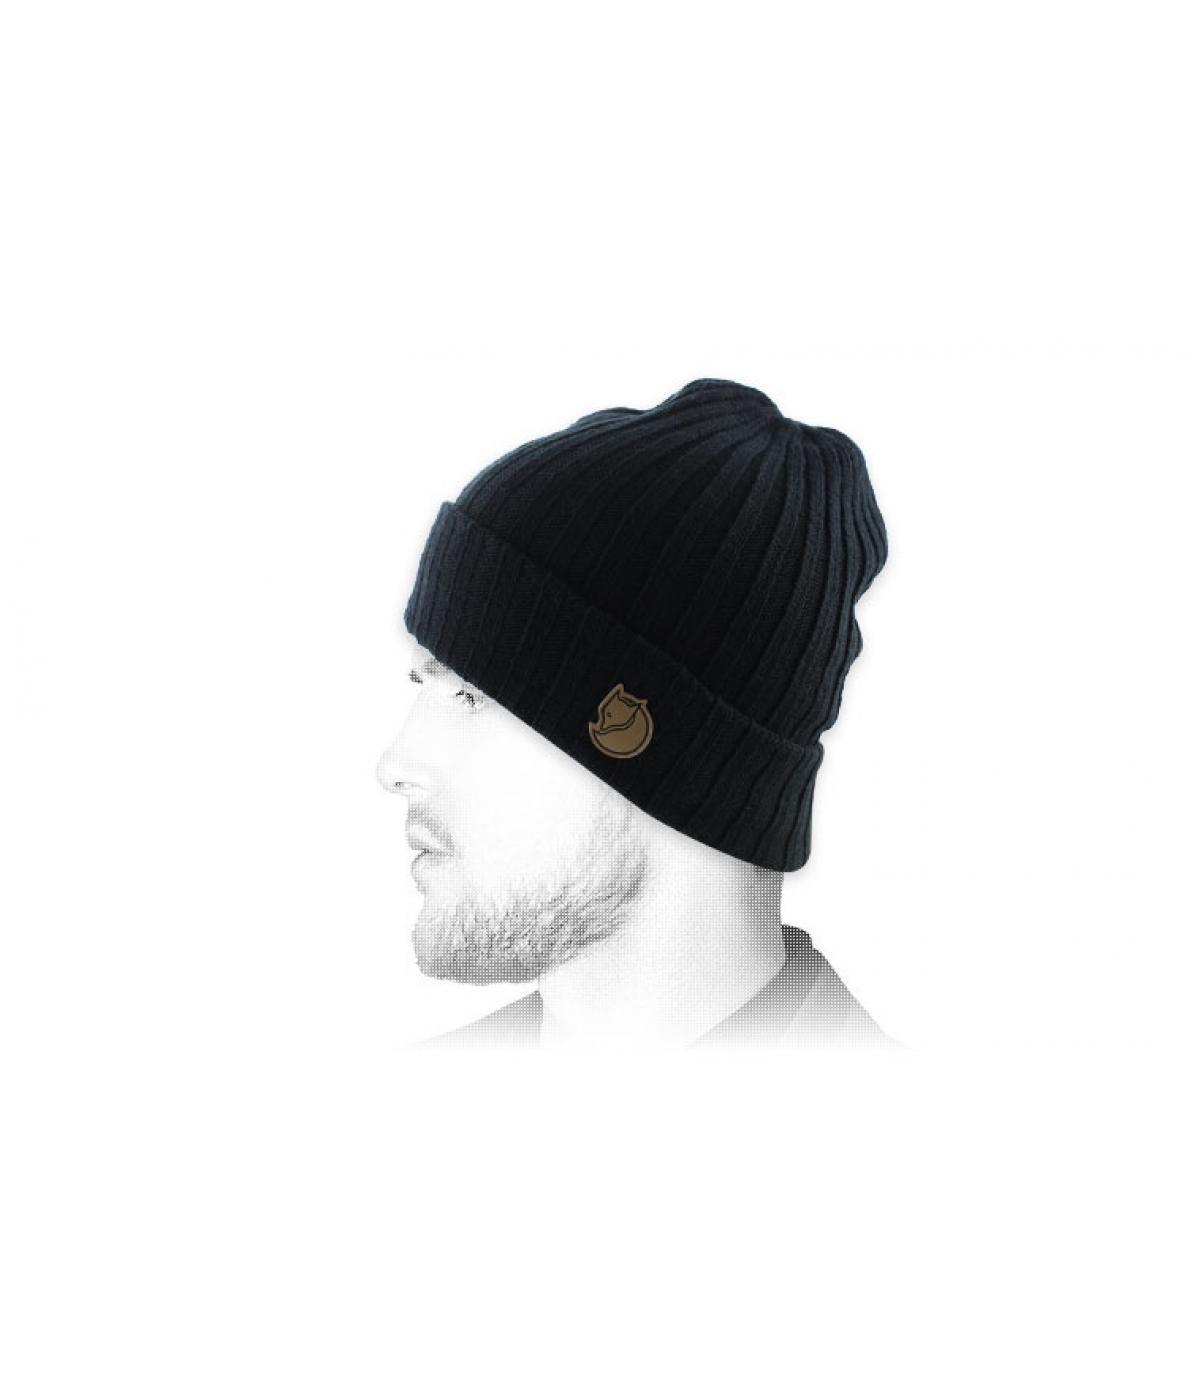 cappello nero bavero Fjällräven